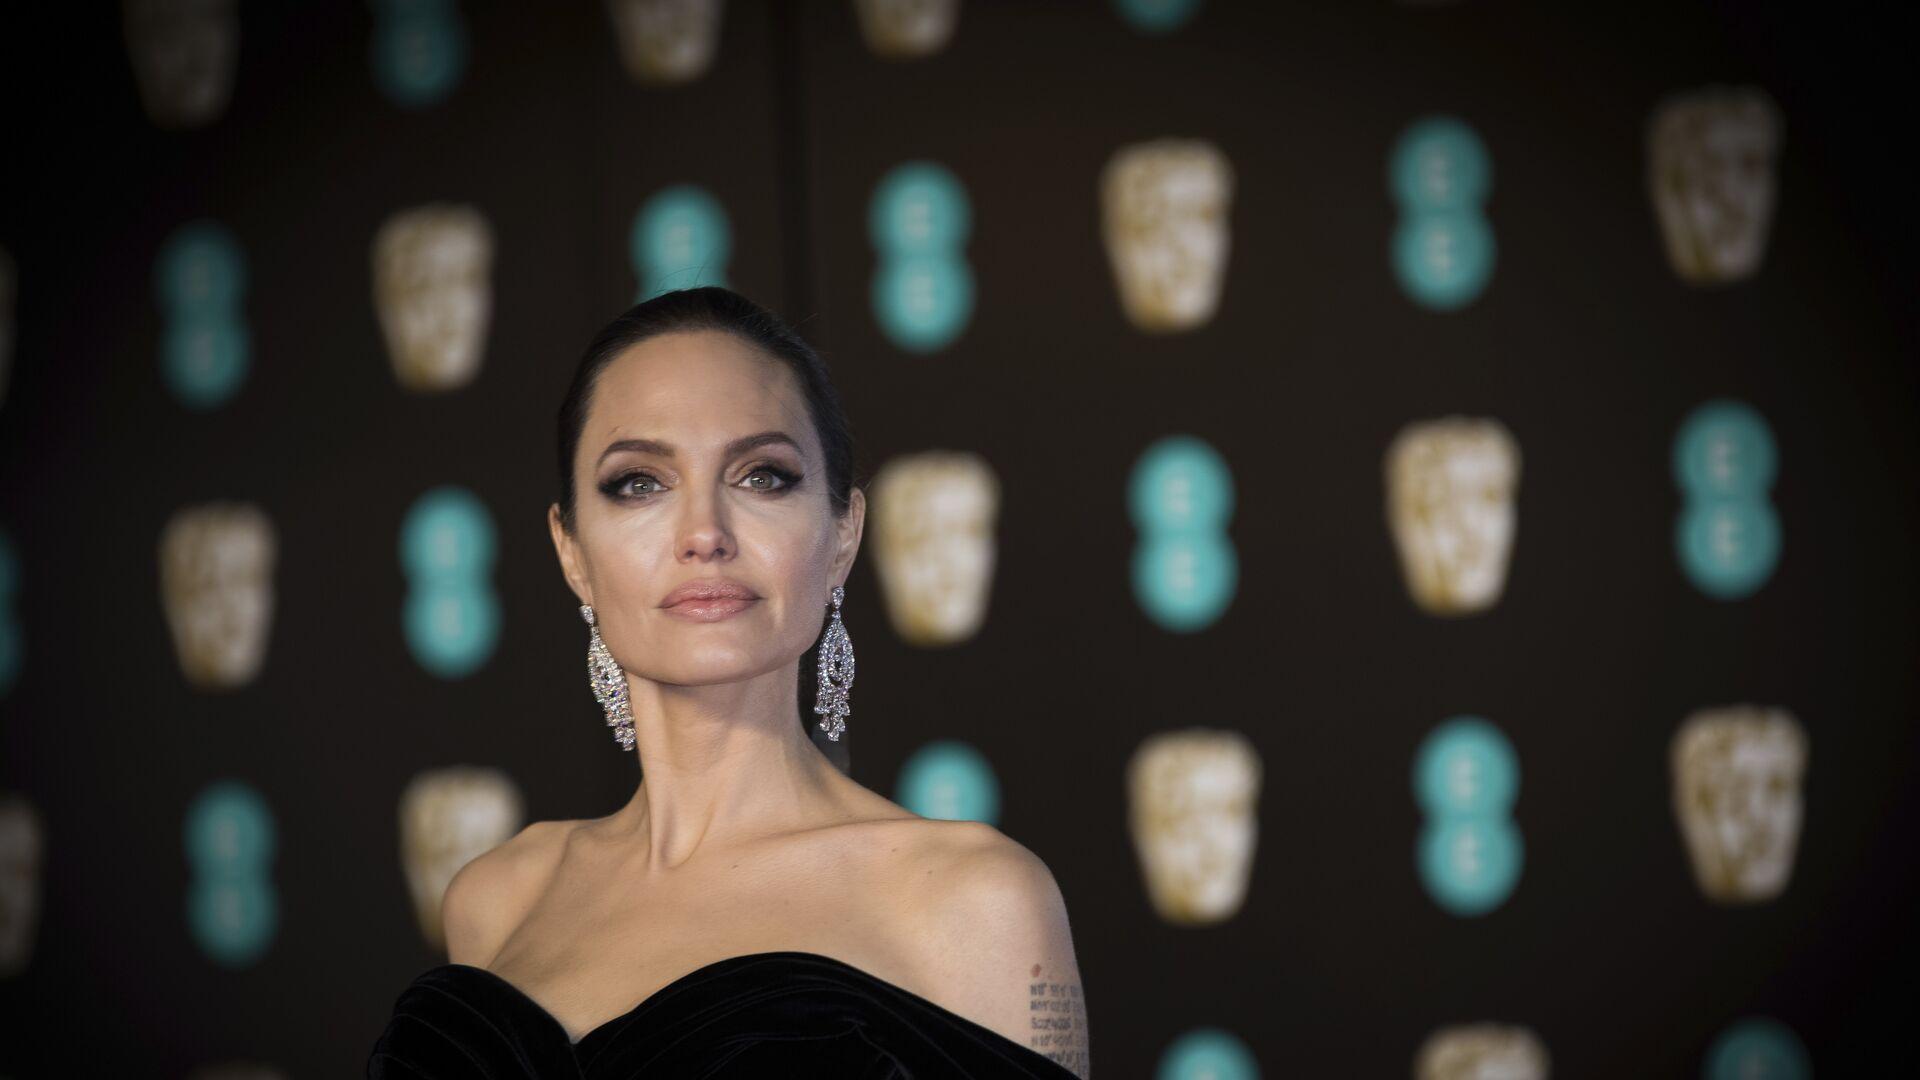 Американская актриса Анджелина Джоли - РИА Новости, 1920, 03.02.2021